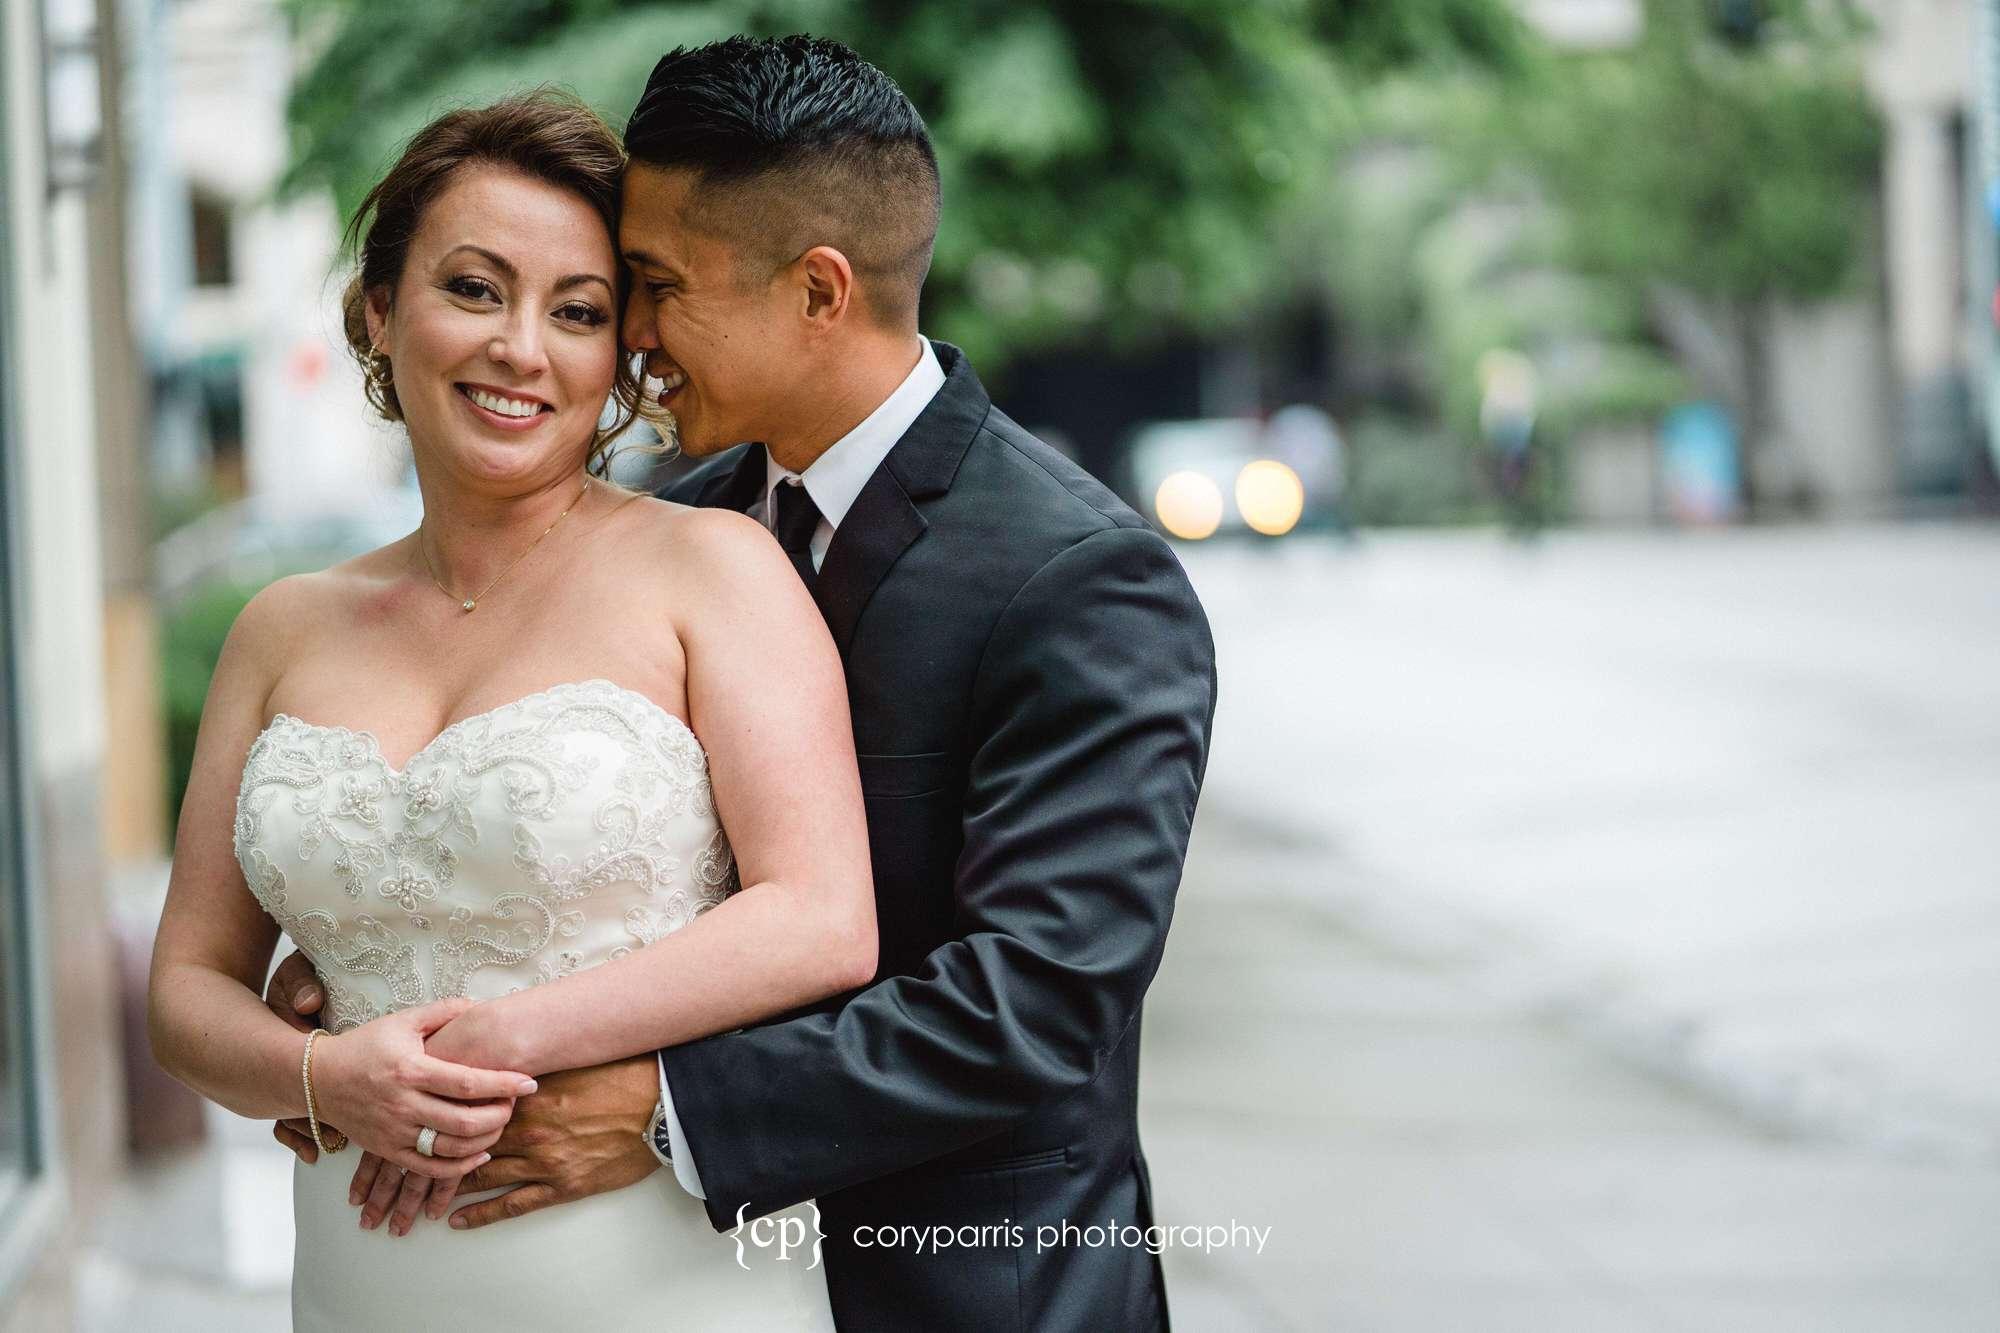 134-seattle-courthouse-wedding-photography.jpg